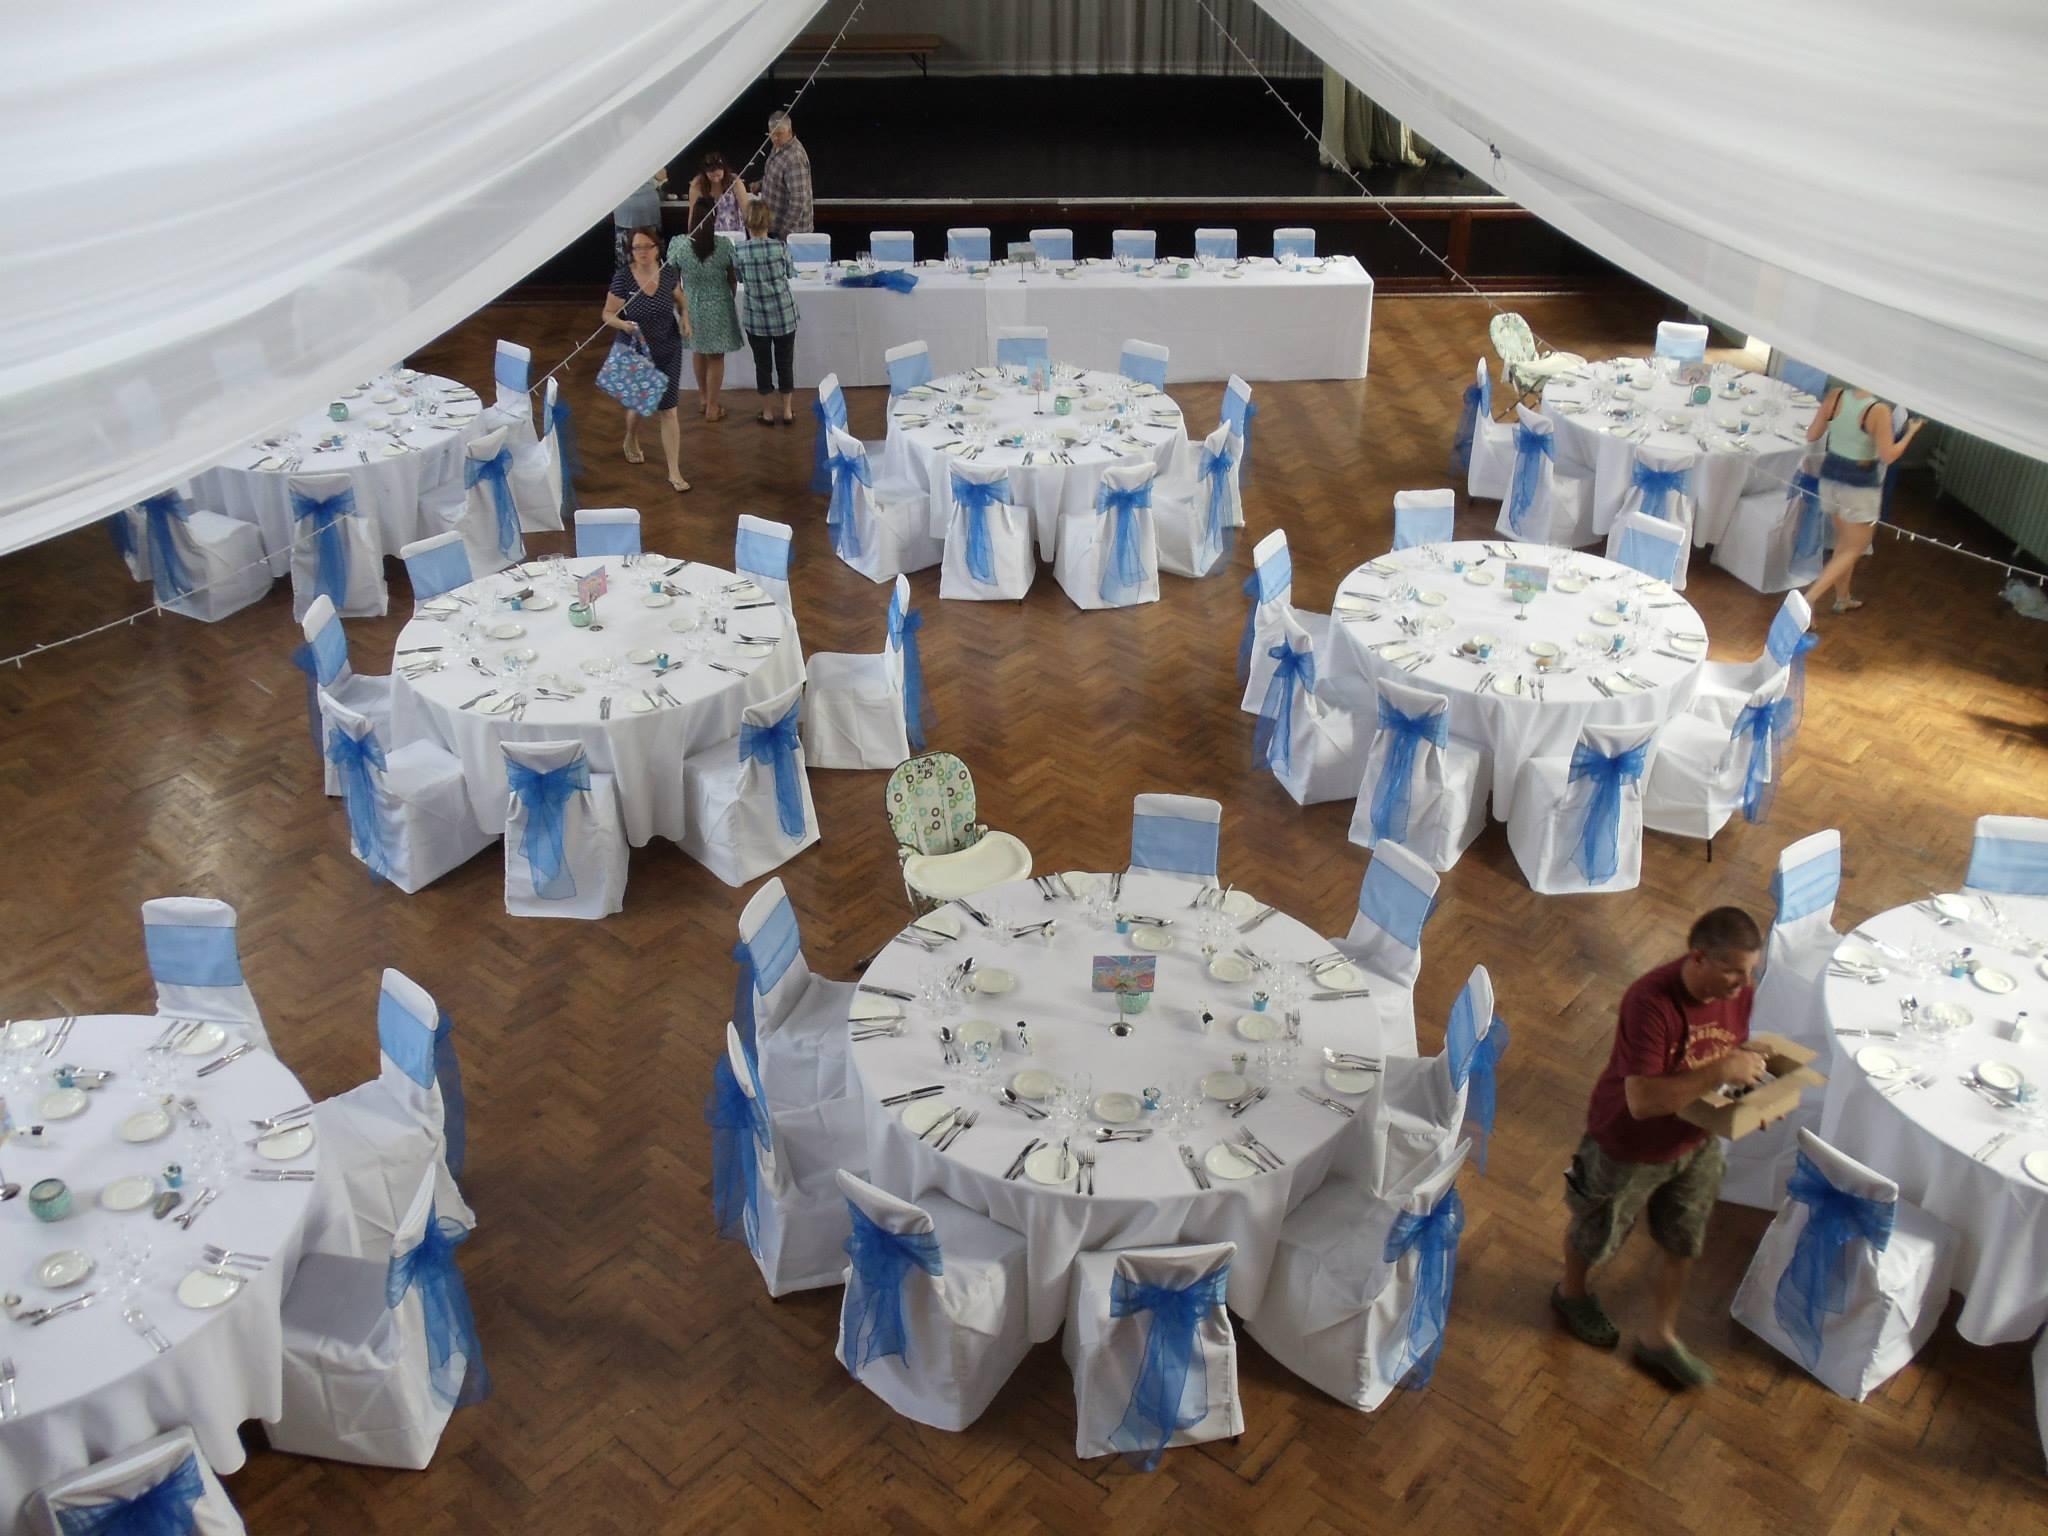 wedding chair cover hire brighton gaming ikea sussex shoreham by sea bigfurrycat co uk